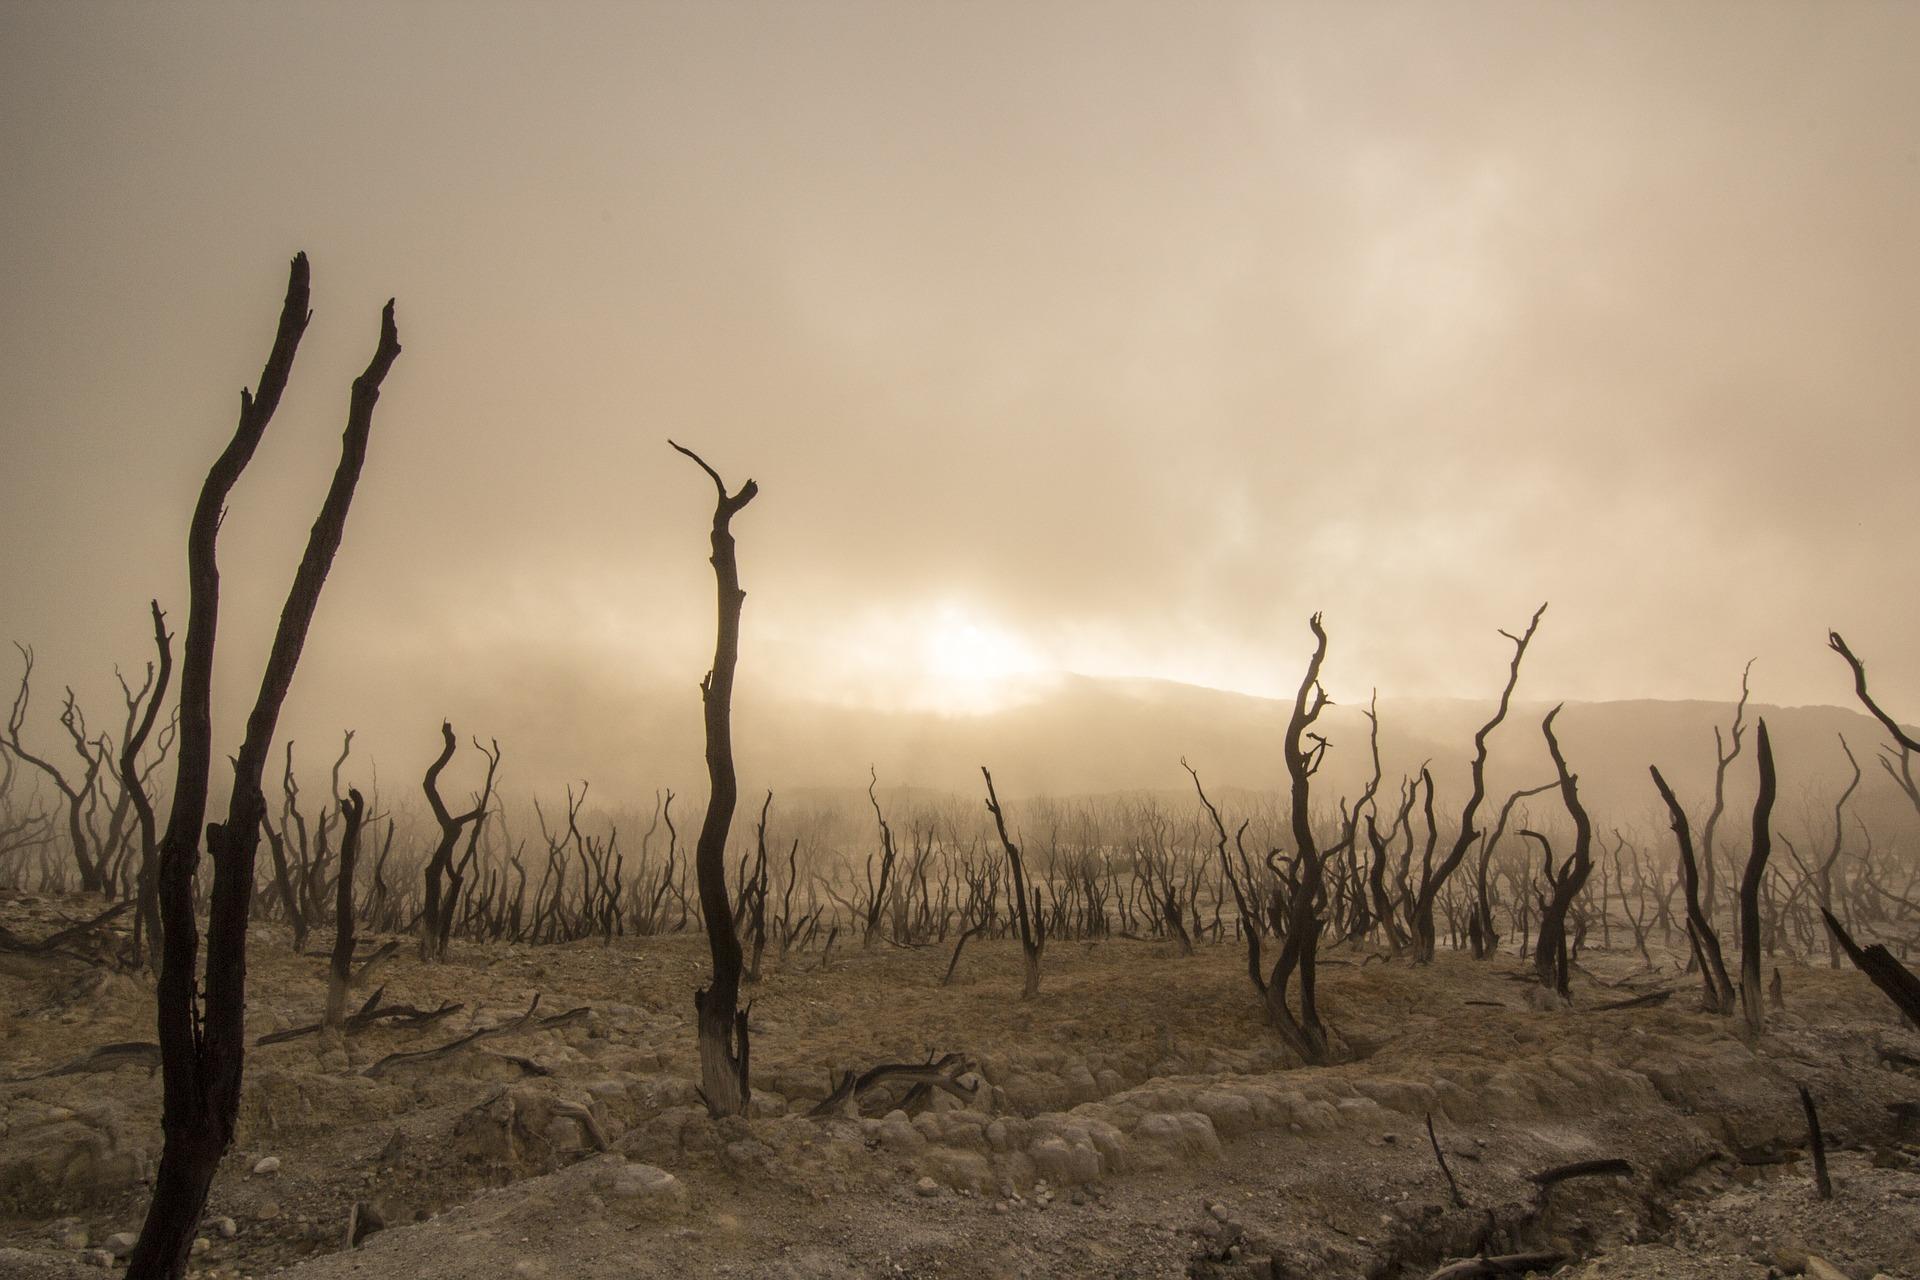 dead-trees-947331_1920.jpg